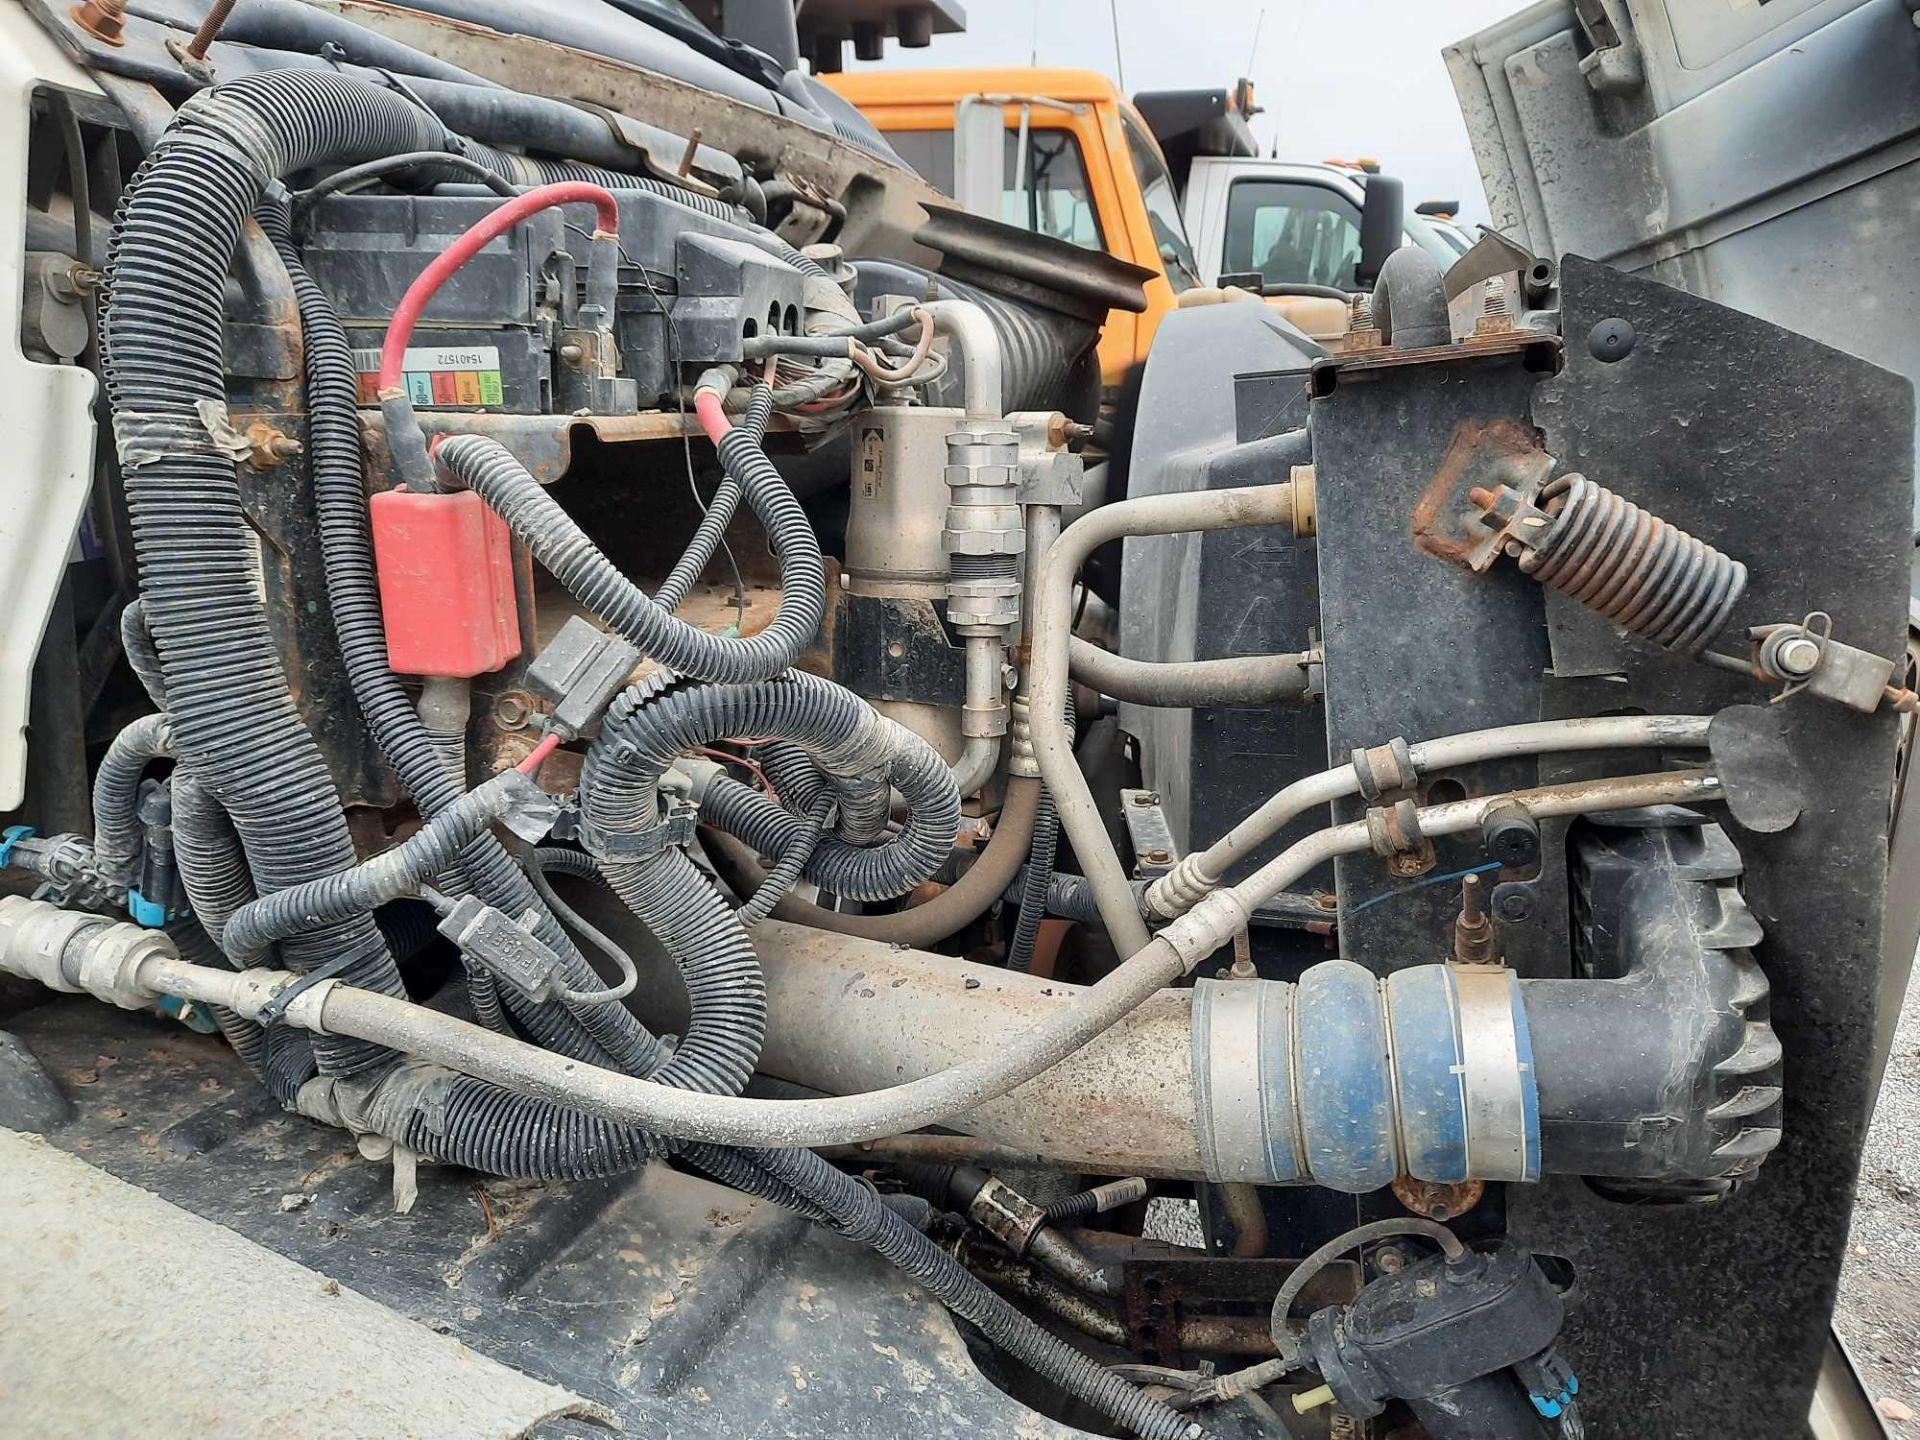 2005 GMC 7500 10' DUMP TRUCK (VDOT UNIT #: R07219) - Image 7 of 16